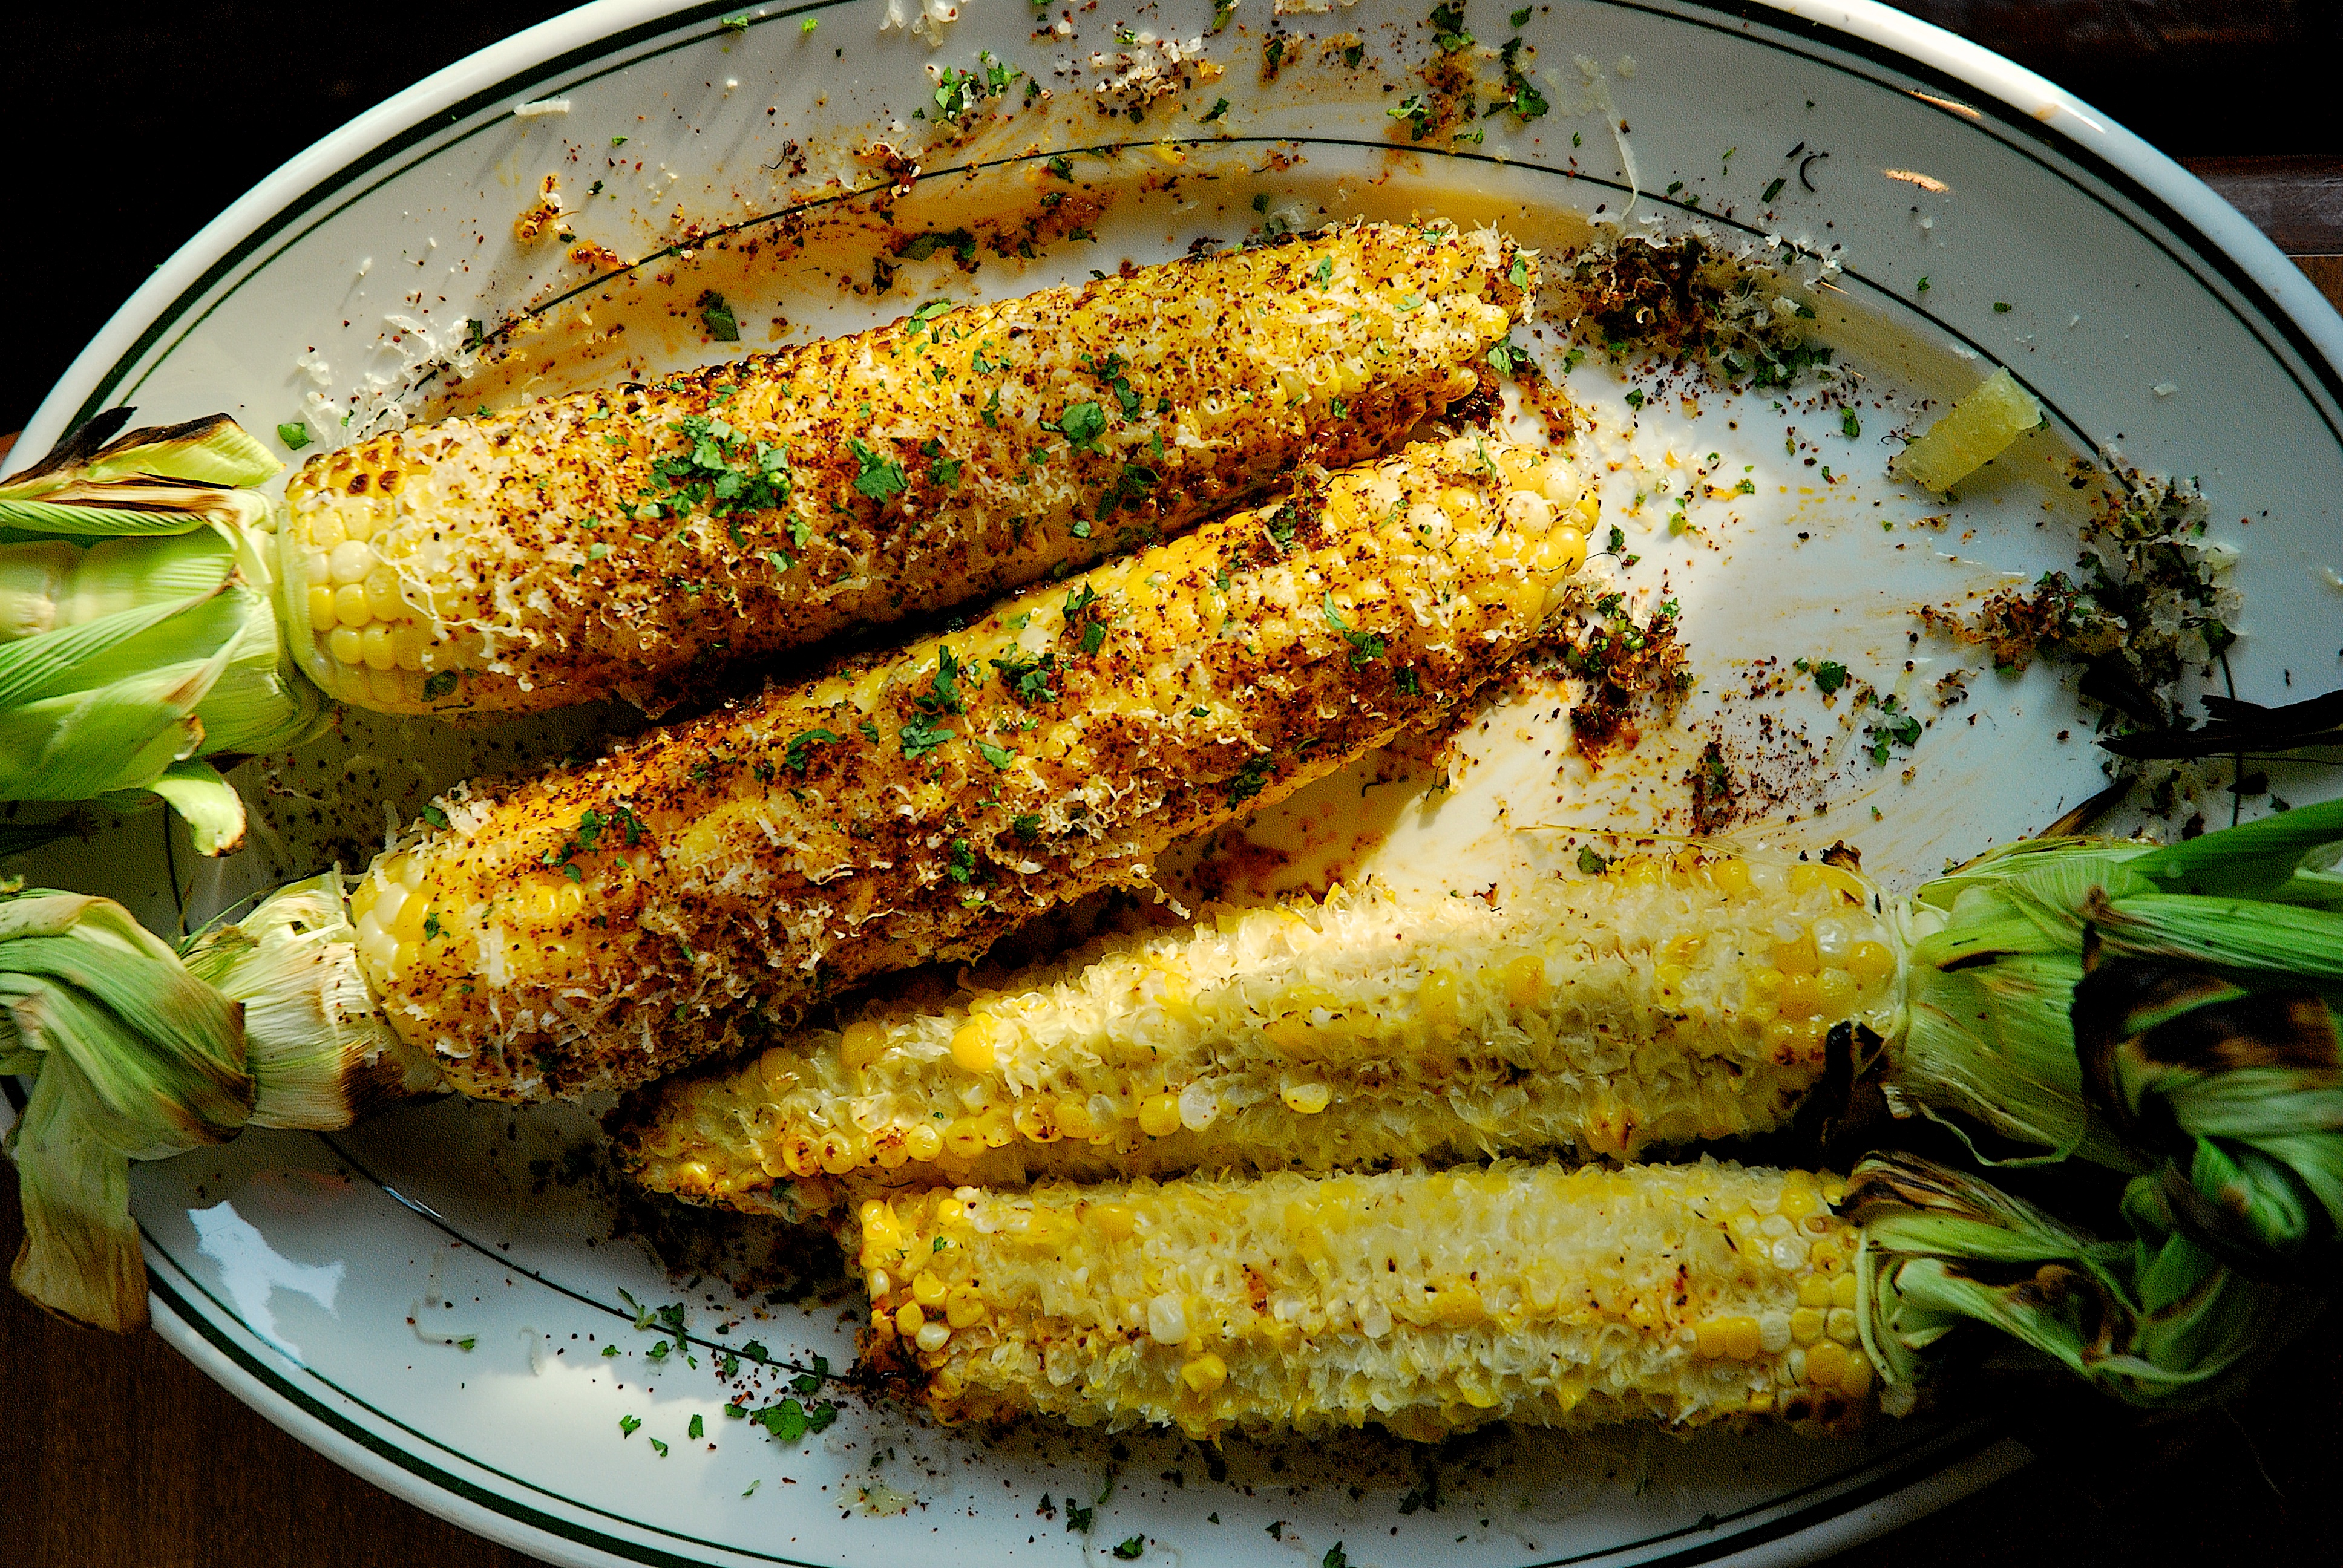 Mexican Street Fair Corn | the bona fide farm food journal